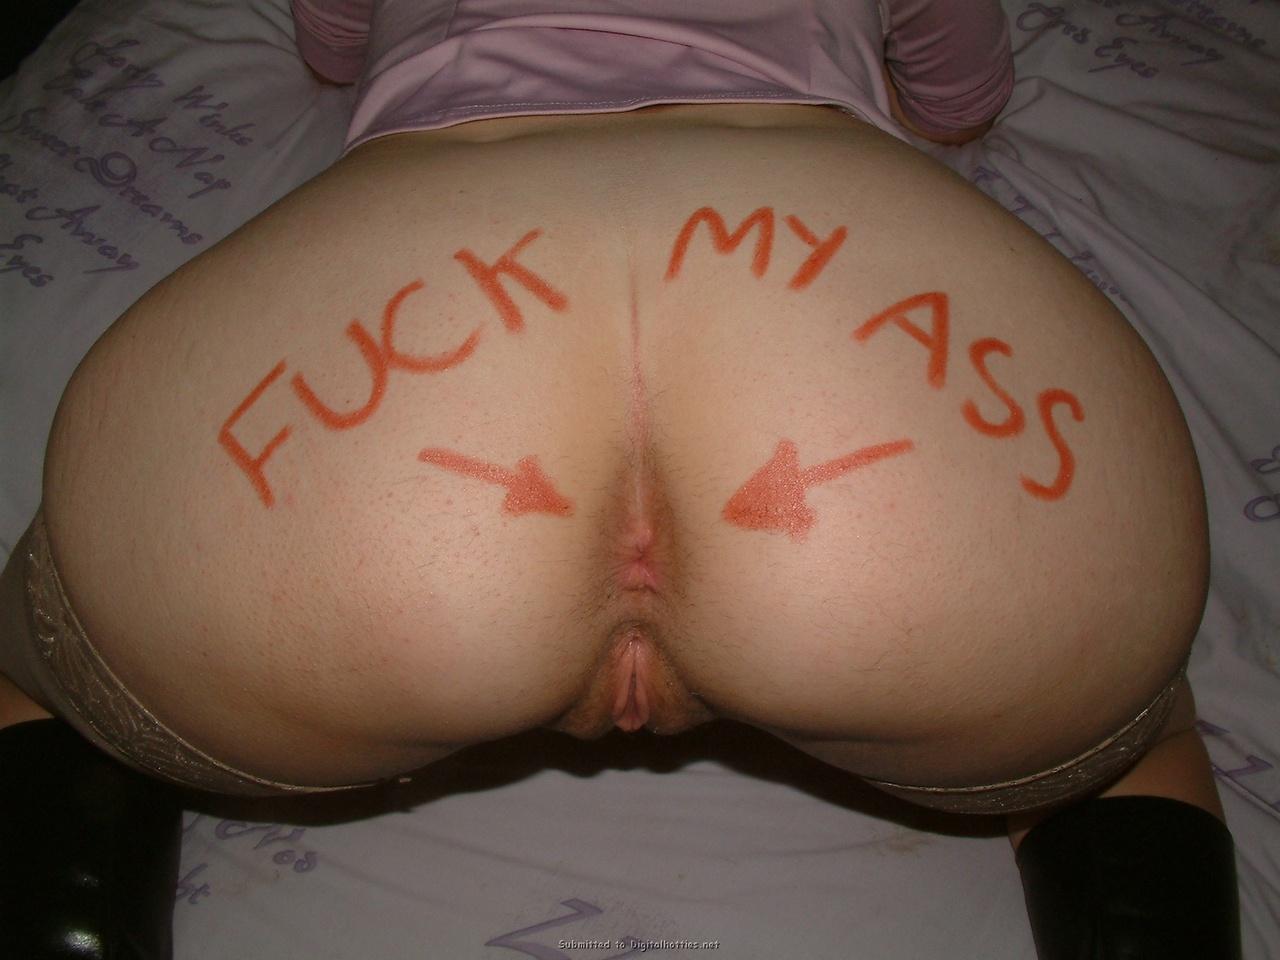 Ass Streams Porn fuck my ass porn pic - eporner